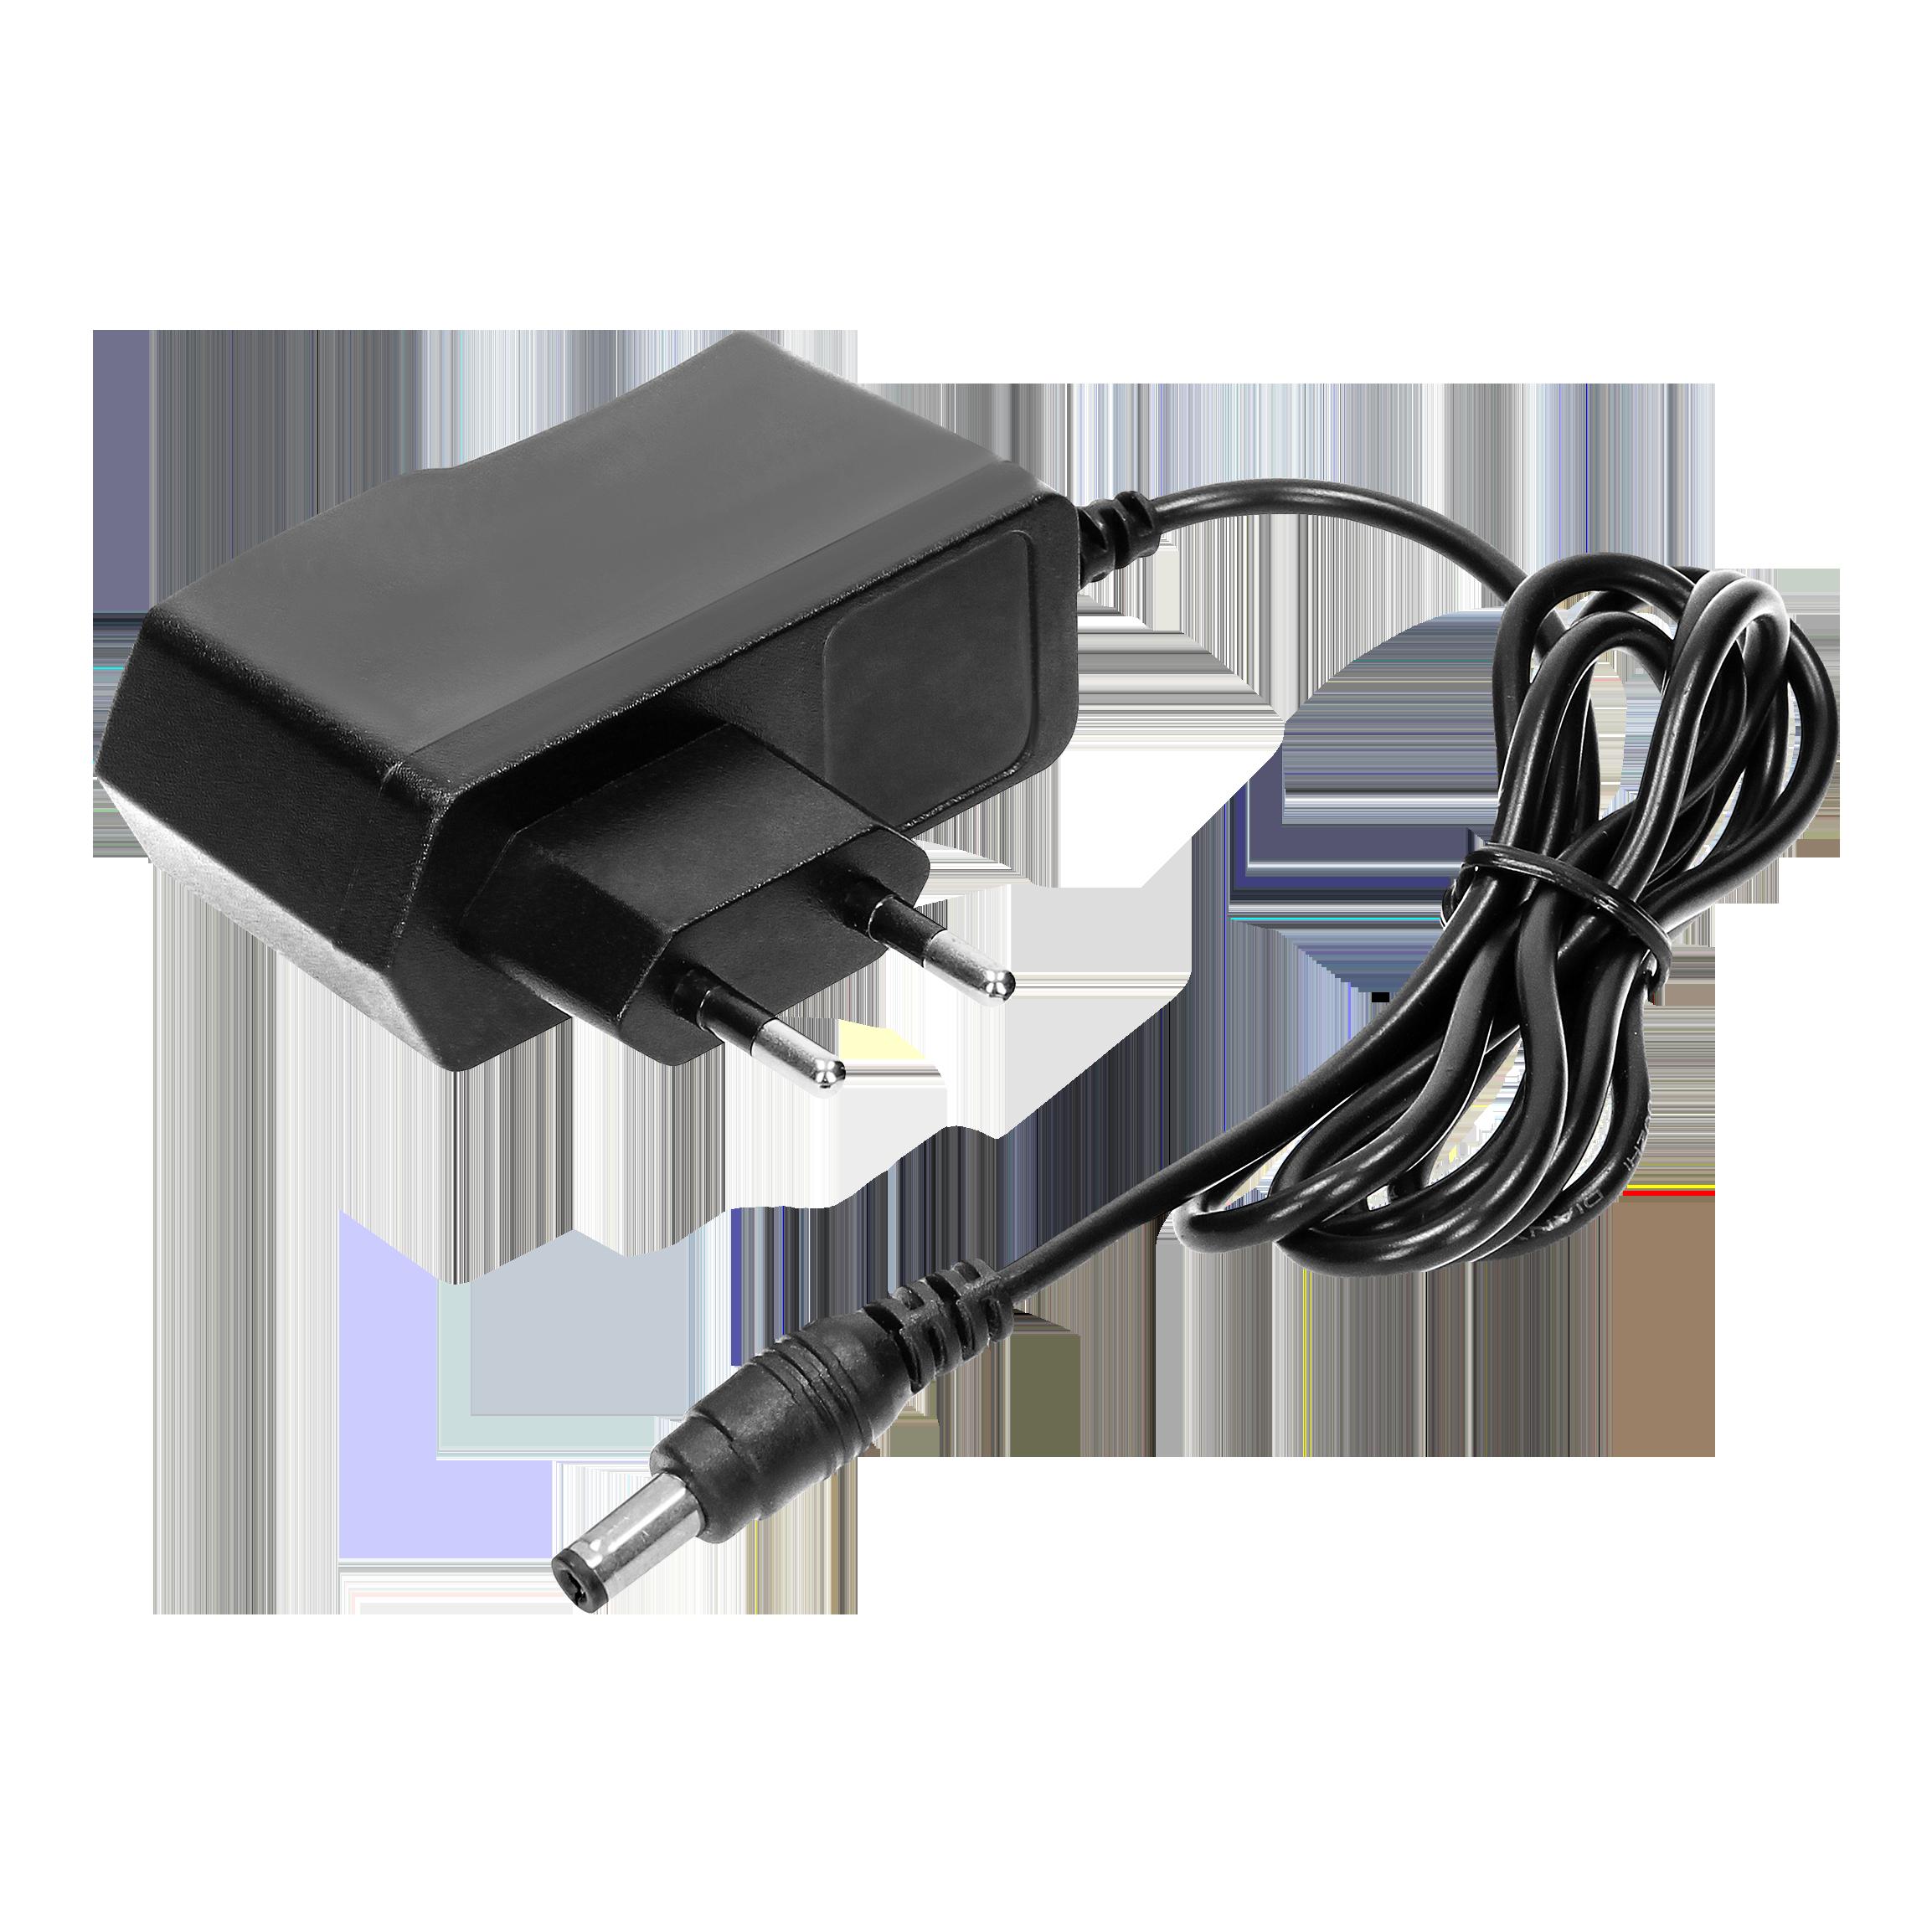 Modular power supply unit 12VDC 1A, plug (5.5 x 2.5mm)